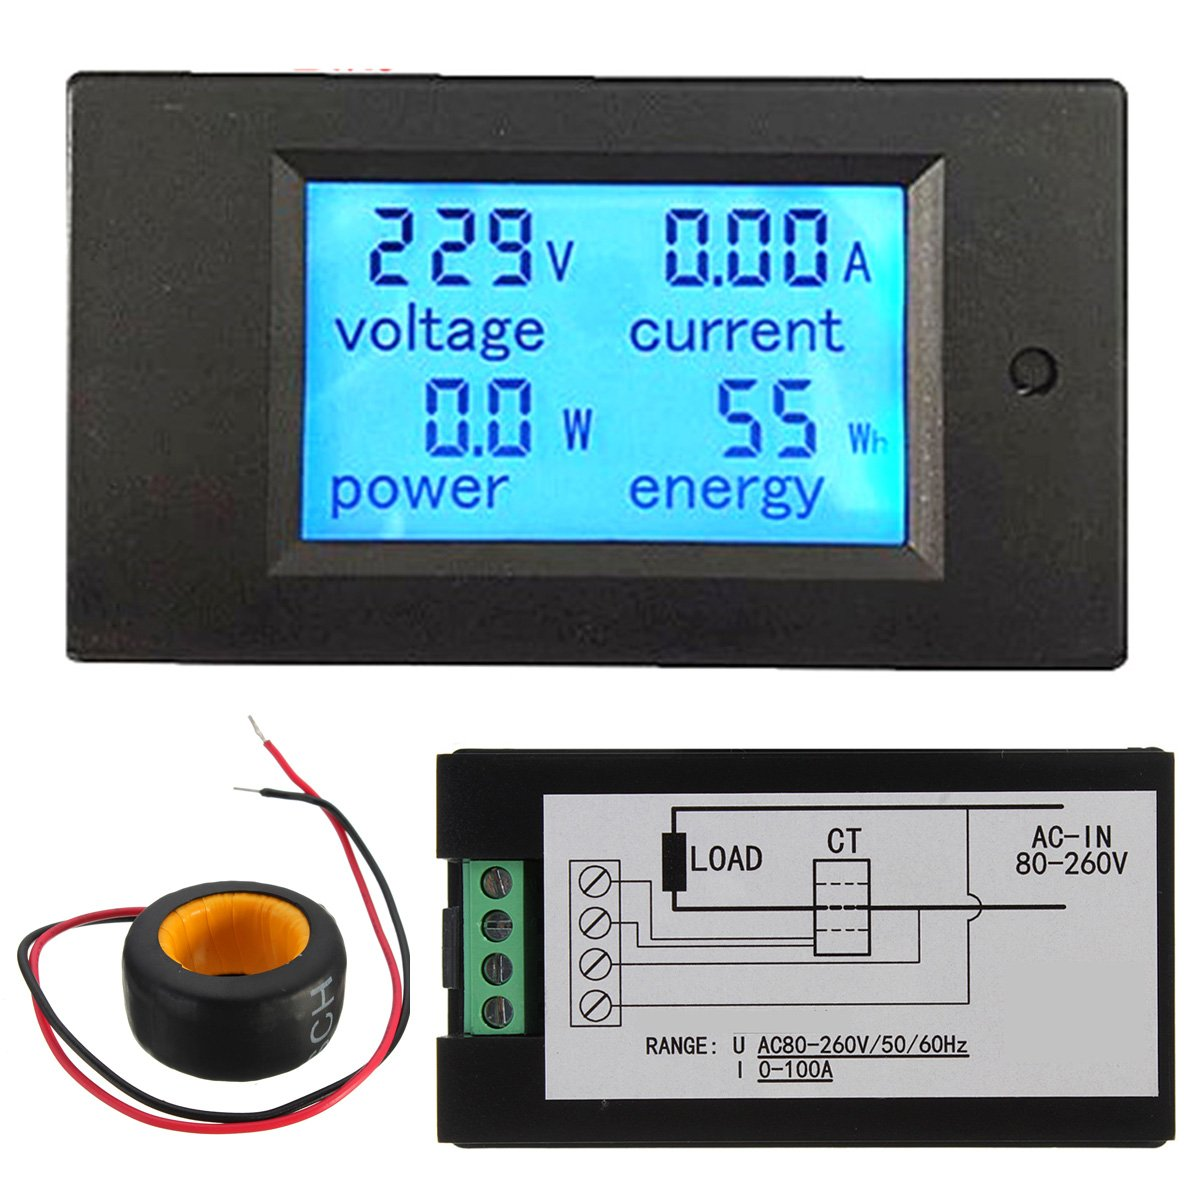 ELEGIANT AC A Digital LED Medidor De Voltaje Electricidad Amperímetro Del Voltímetro